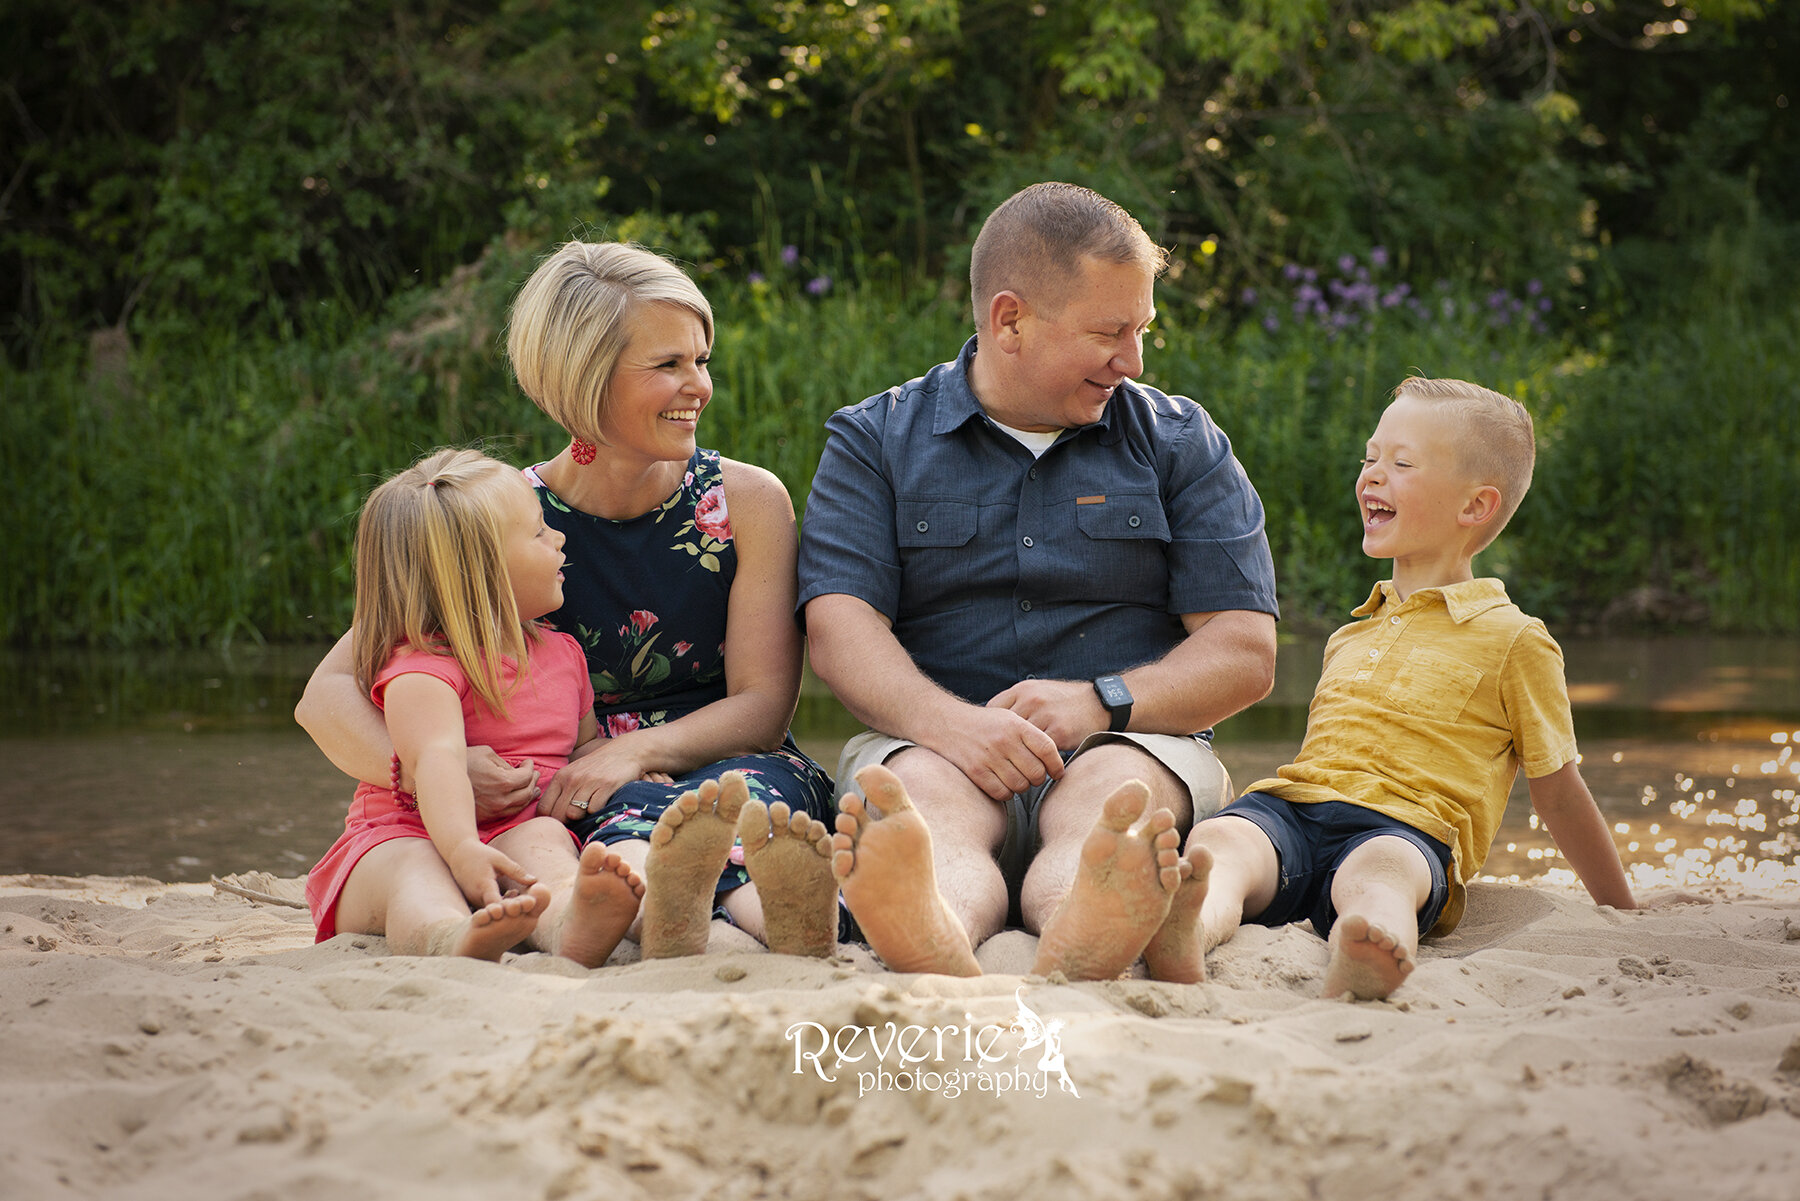 professional family photographer river falls wisconsin rachel paulus.jpg